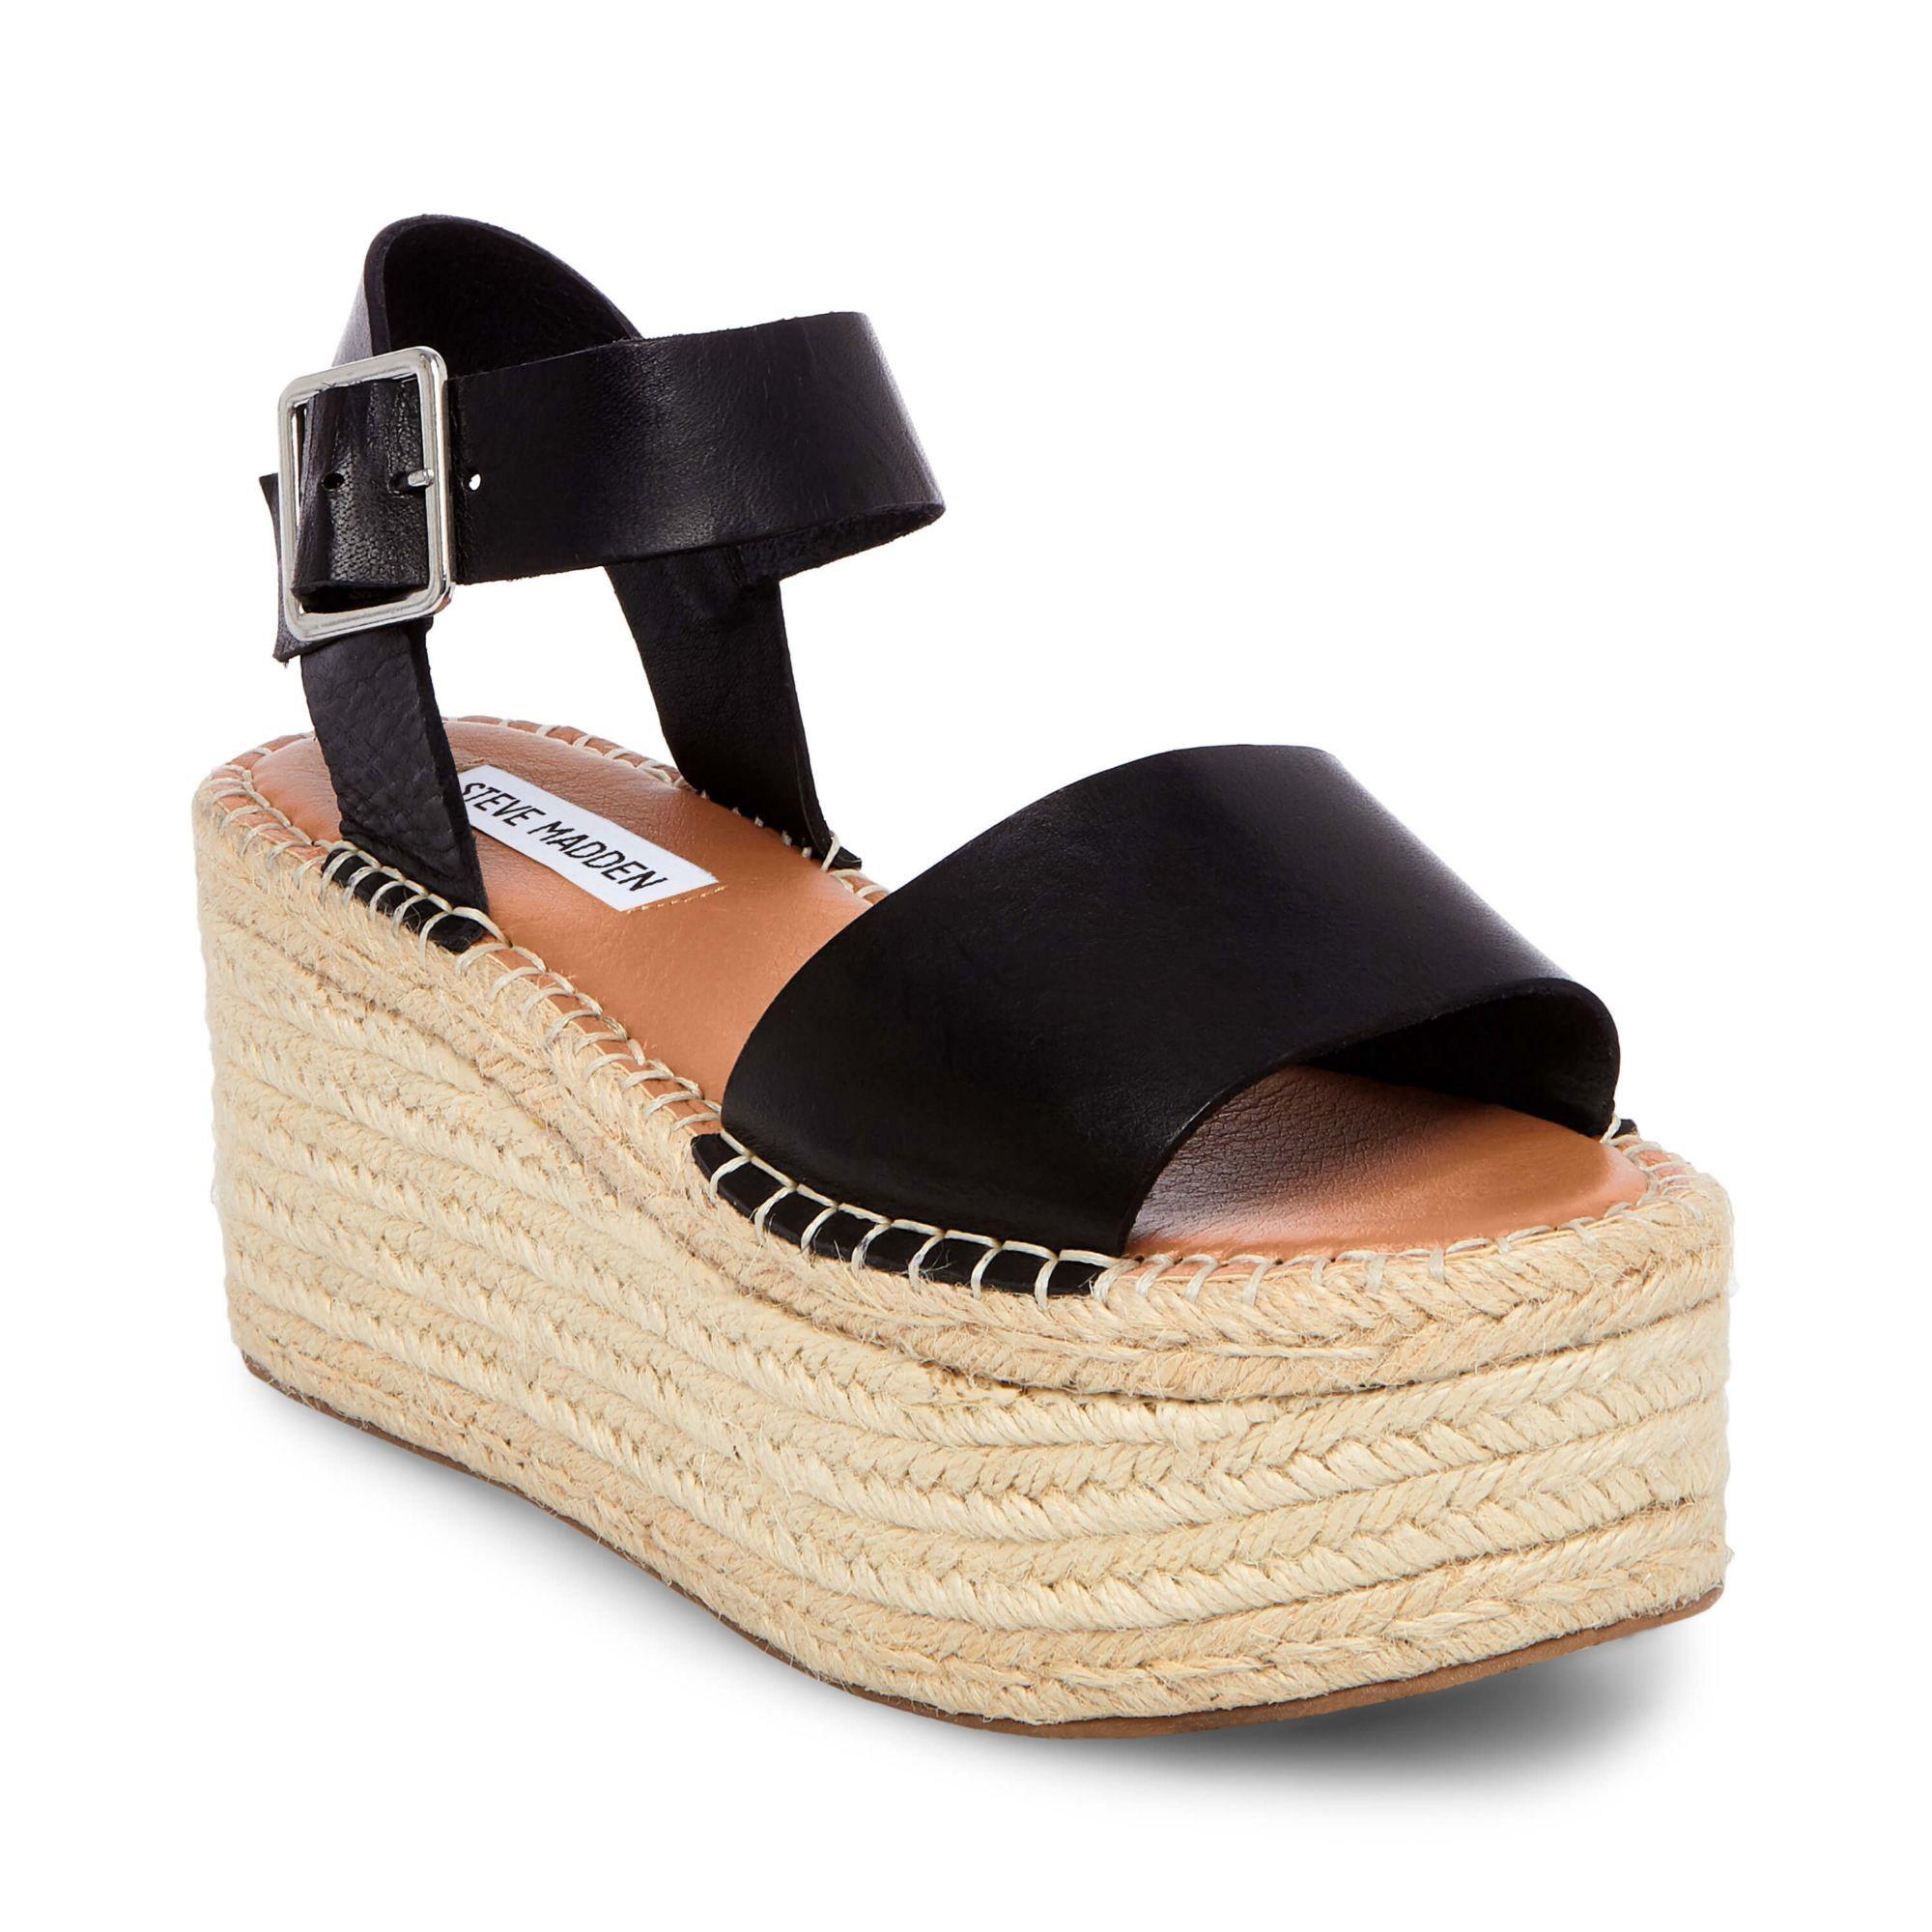 2a50693546a STEVE MADDEN CABO.  stevemadden  shoes   Steve Madden Style